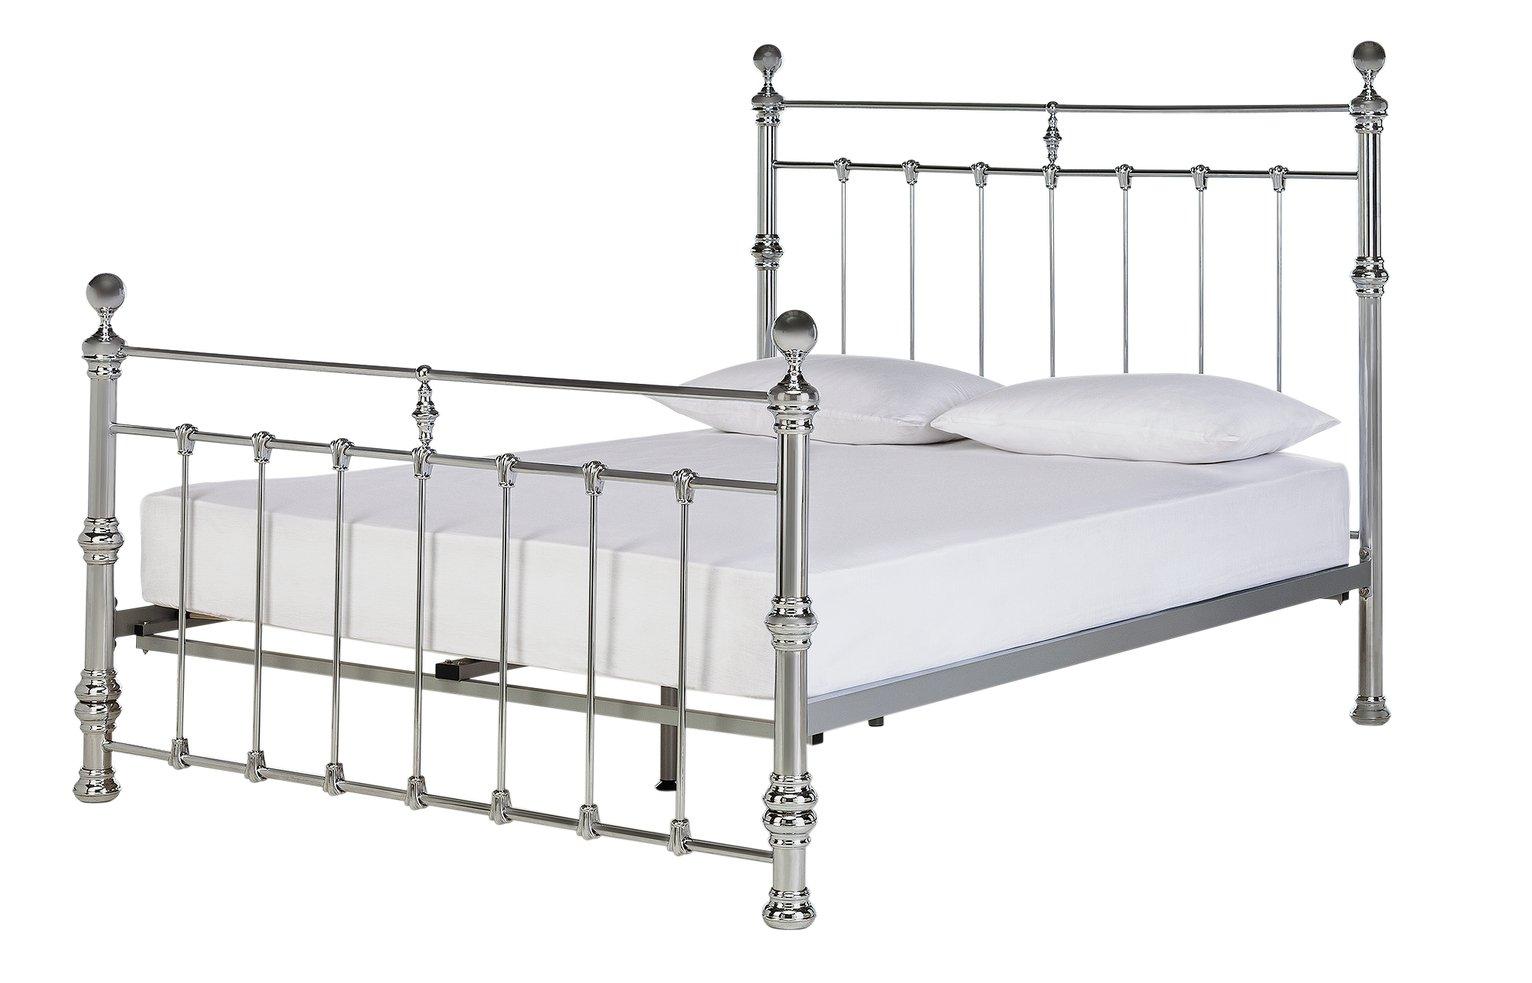 buy online b413a df870 Argos Home Conan Super Kingsize Bed Frame - Chrome (5417234 ...